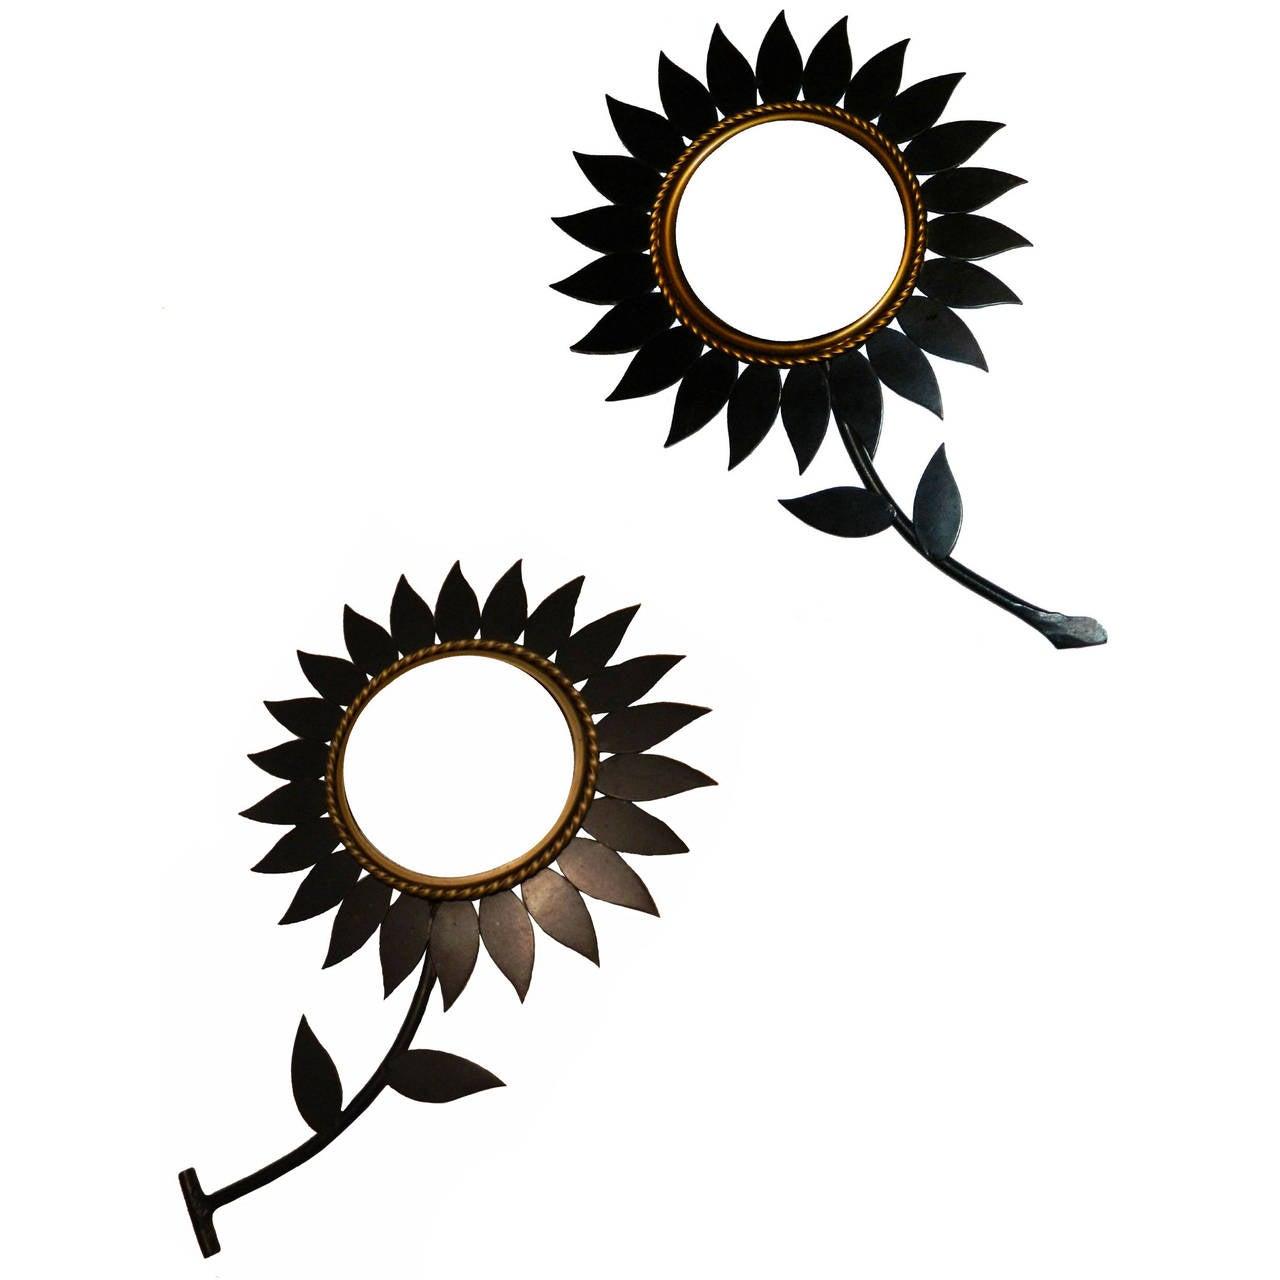 Pair of Signed Chaty Flower Sunburst Mirrors